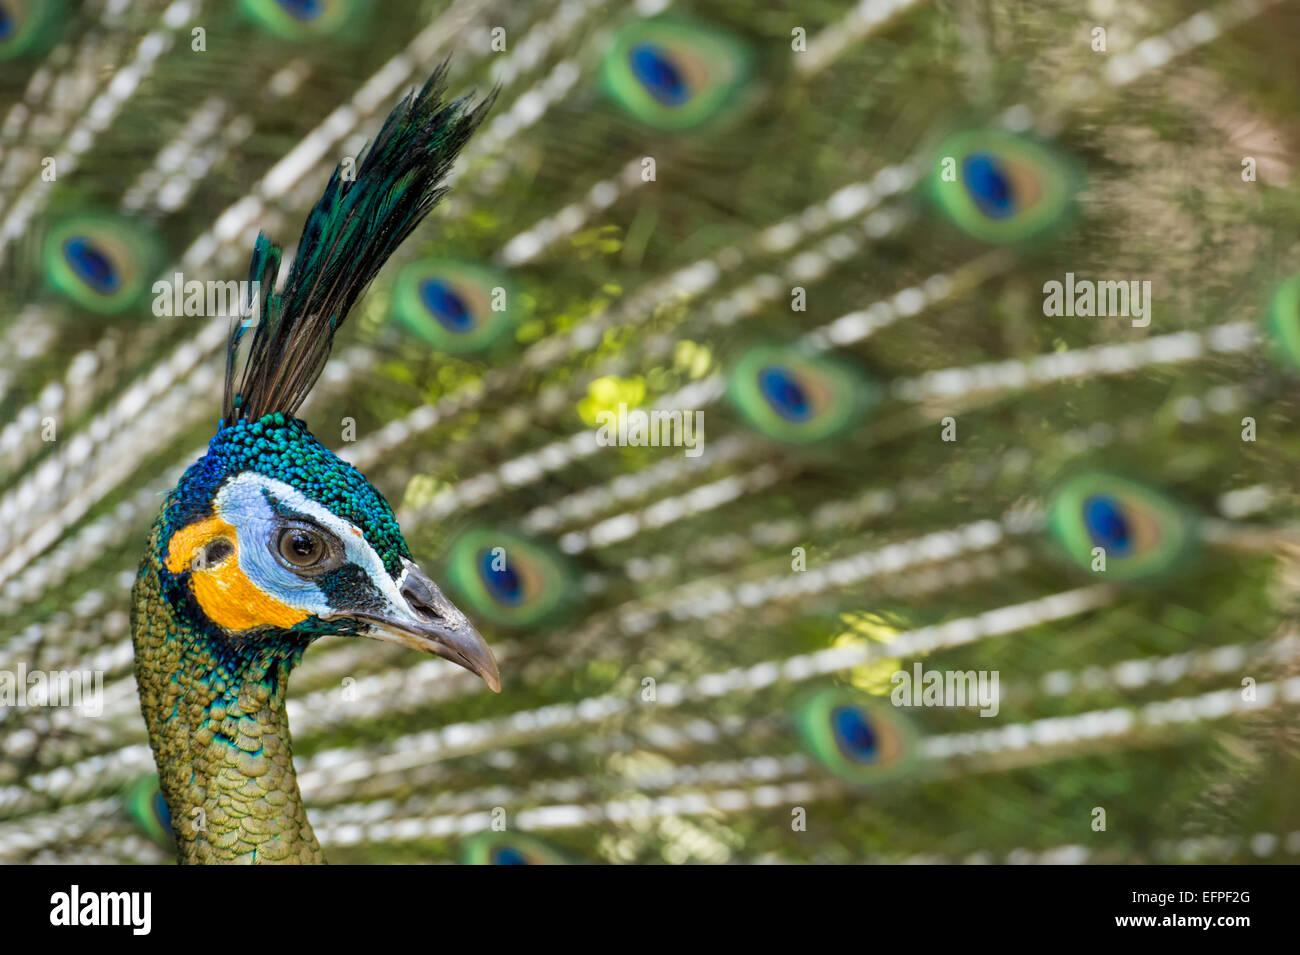 Java green peafowl (Pavo muticus), Bali Bird Park, Indonesia, Southeast Asia, Asia - Stock Image